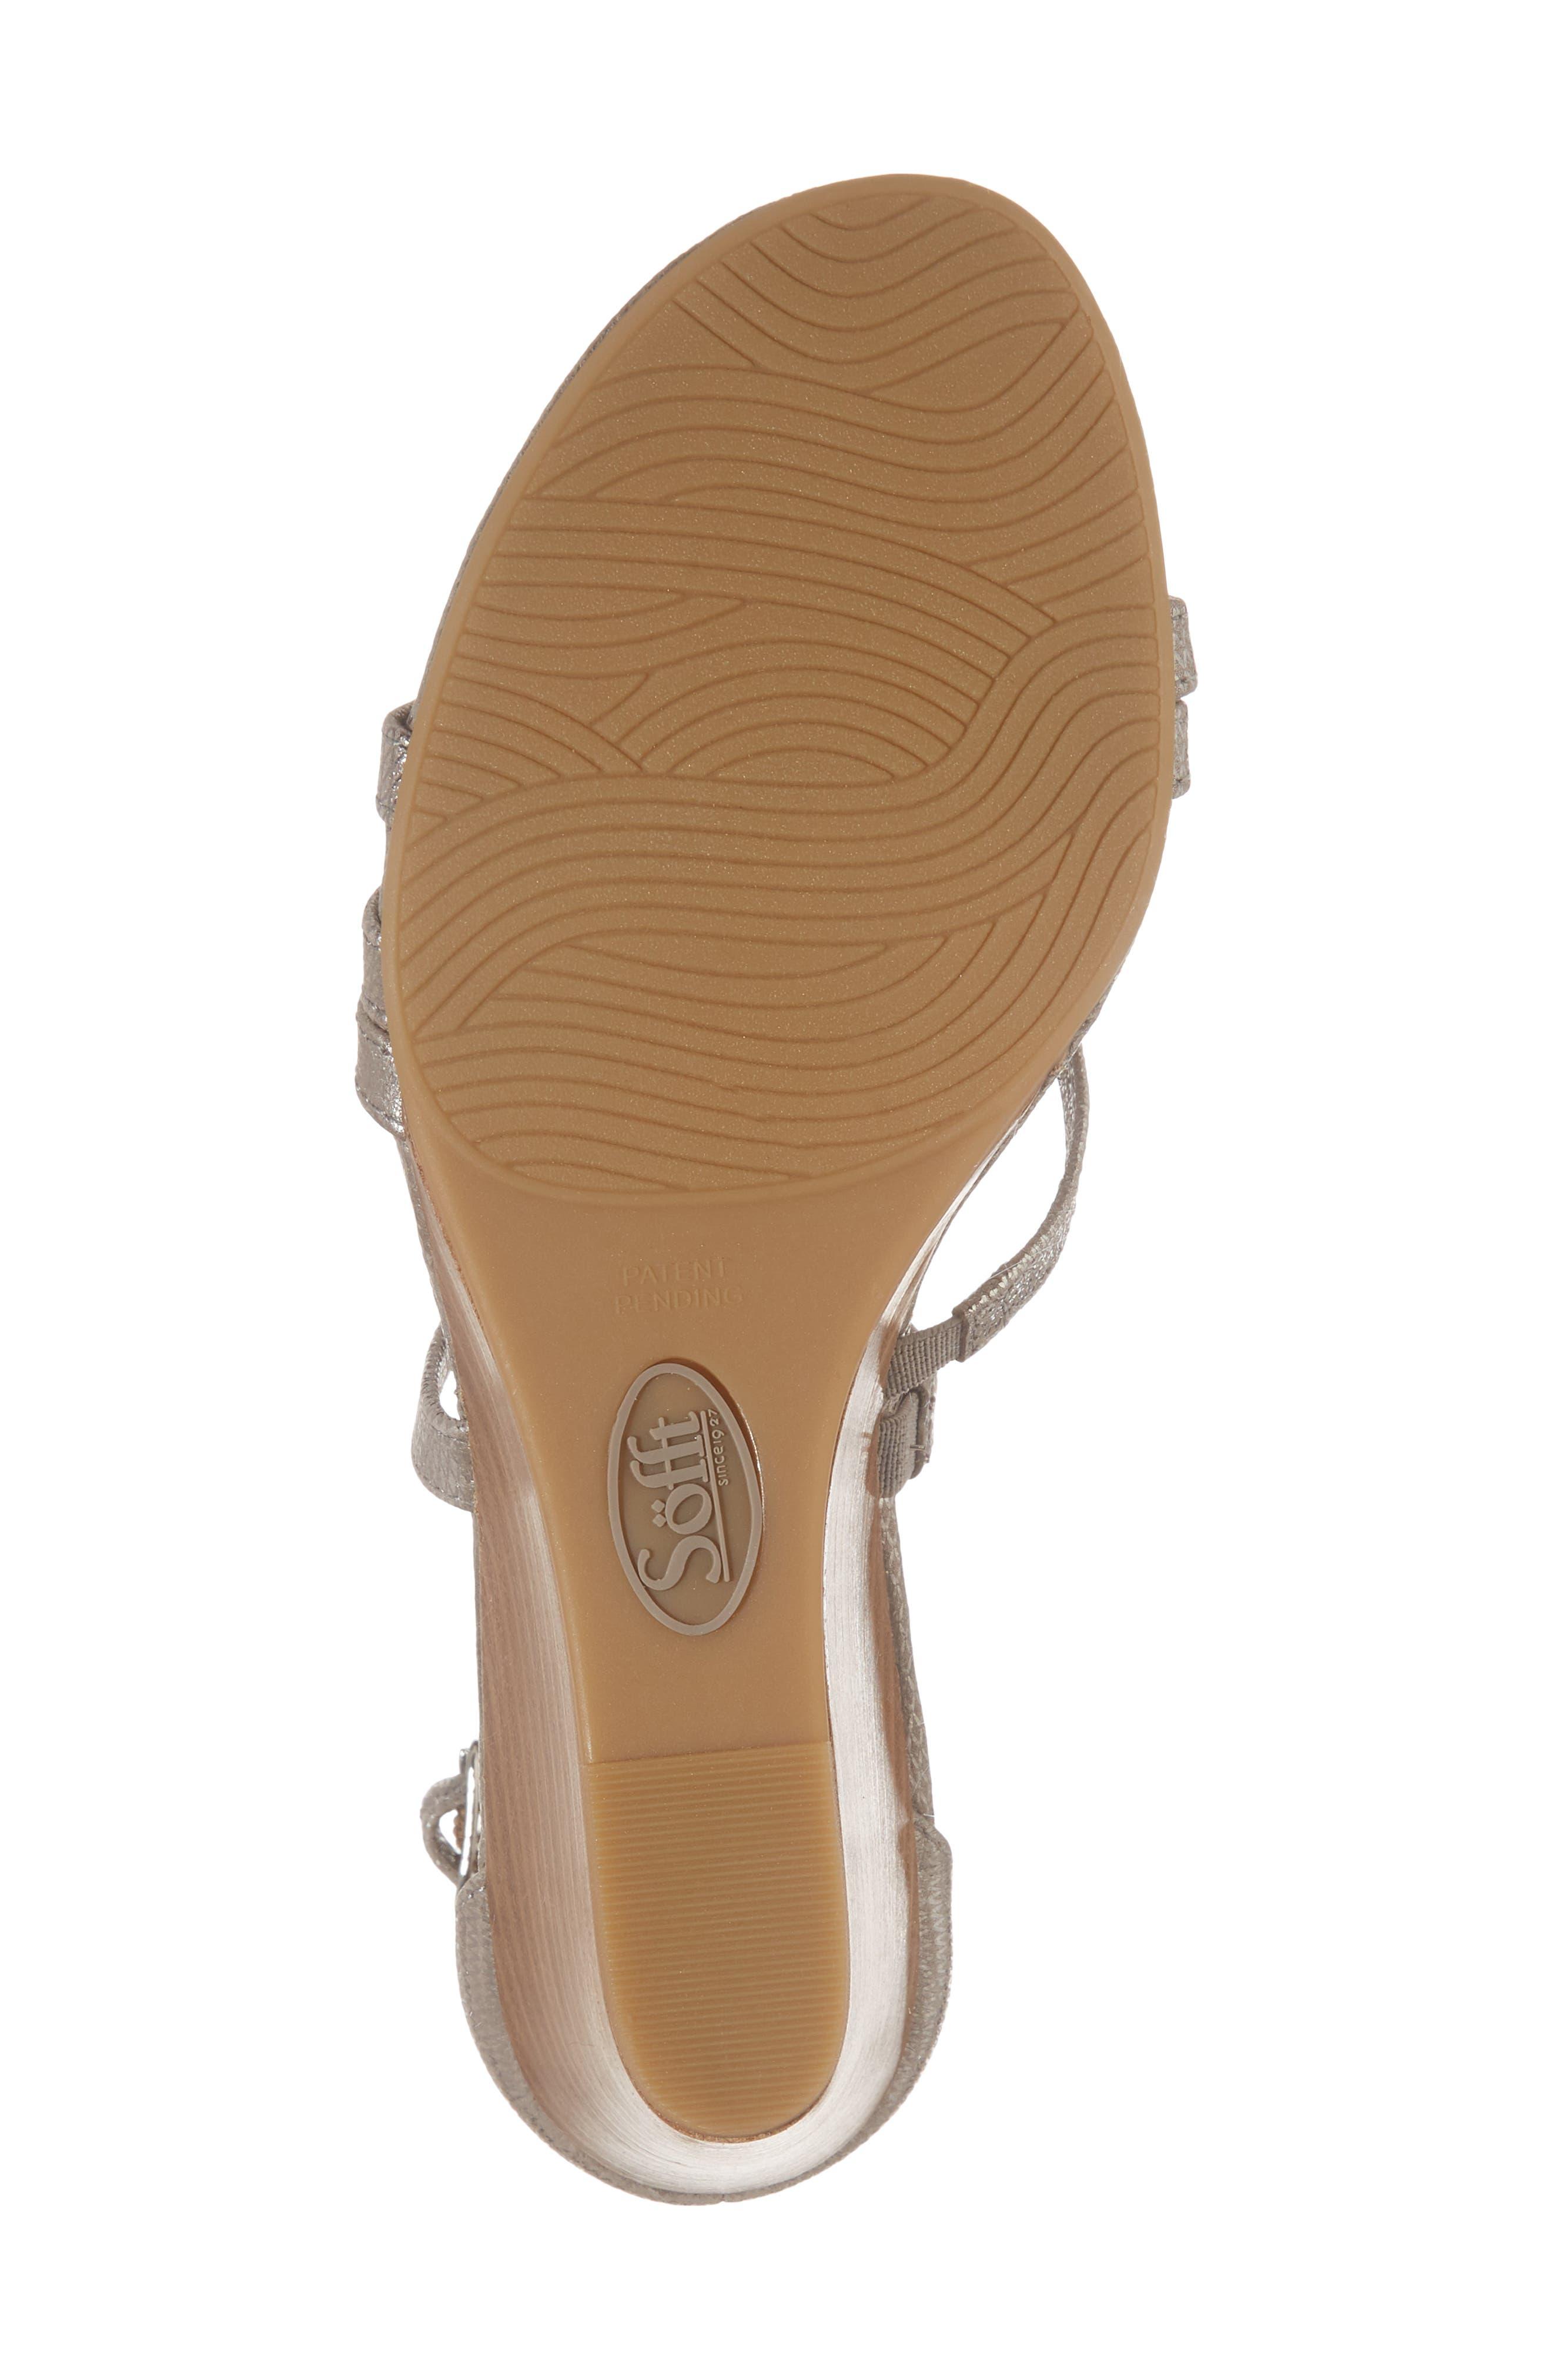 Mecina Wedge Sandal,                             Alternate thumbnail 6, color,                             Silver Metallic Leather